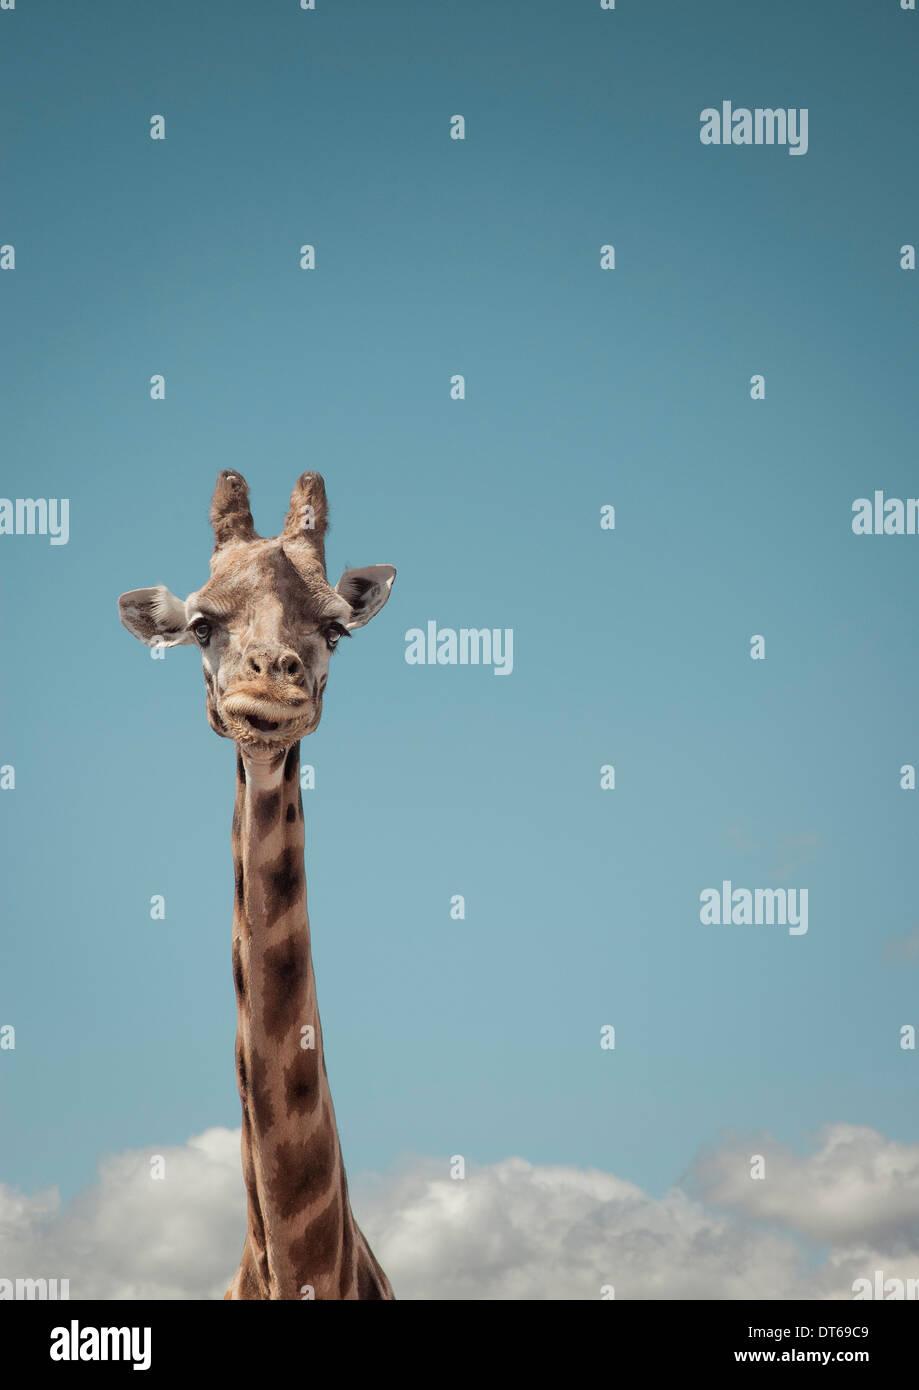 Portrait de girafe et ciel bleu Photo Stock